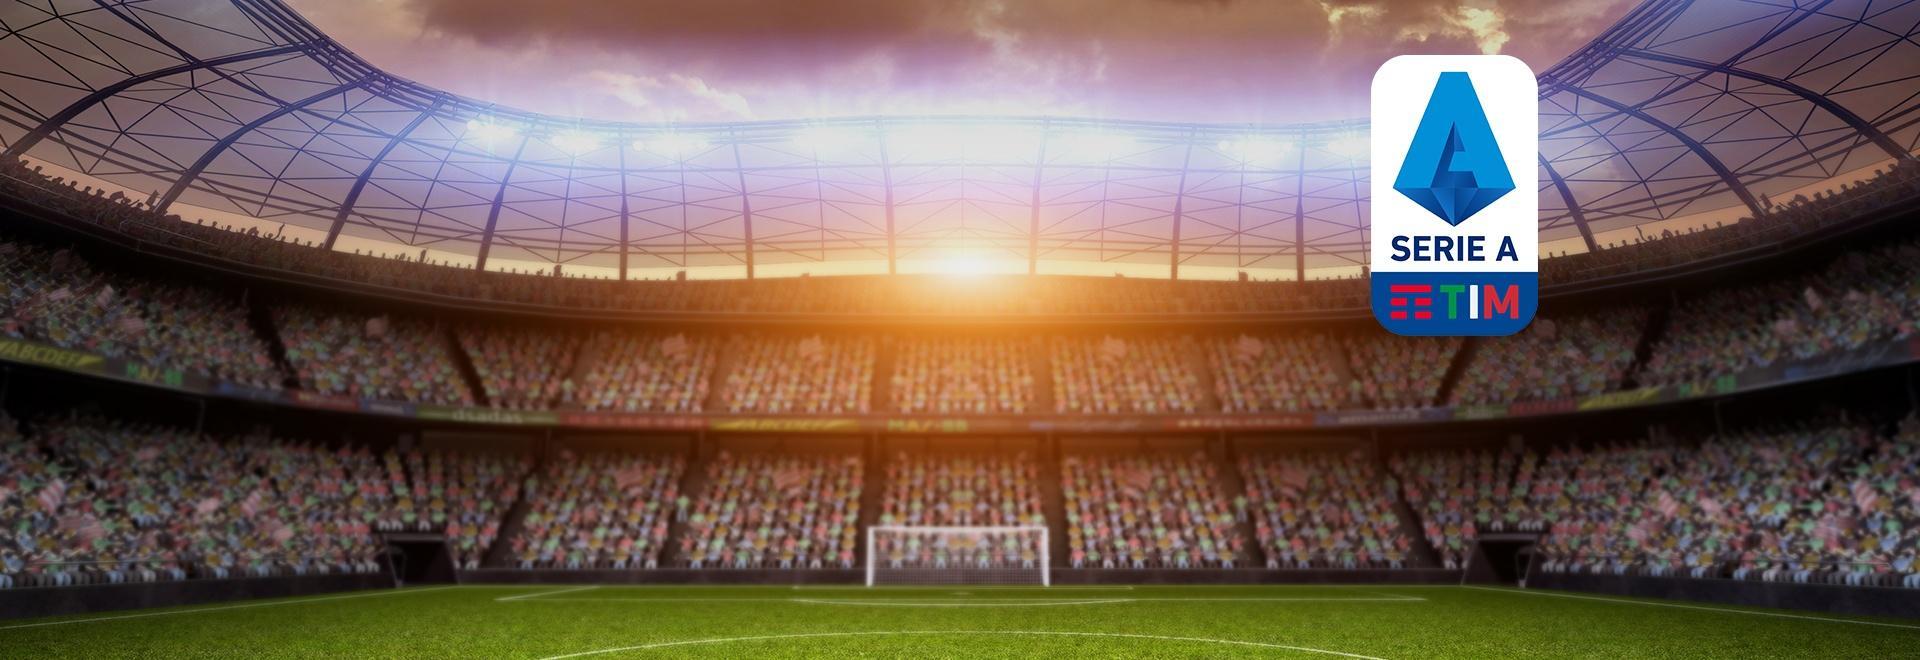 Highlights Serie A 2019/2020